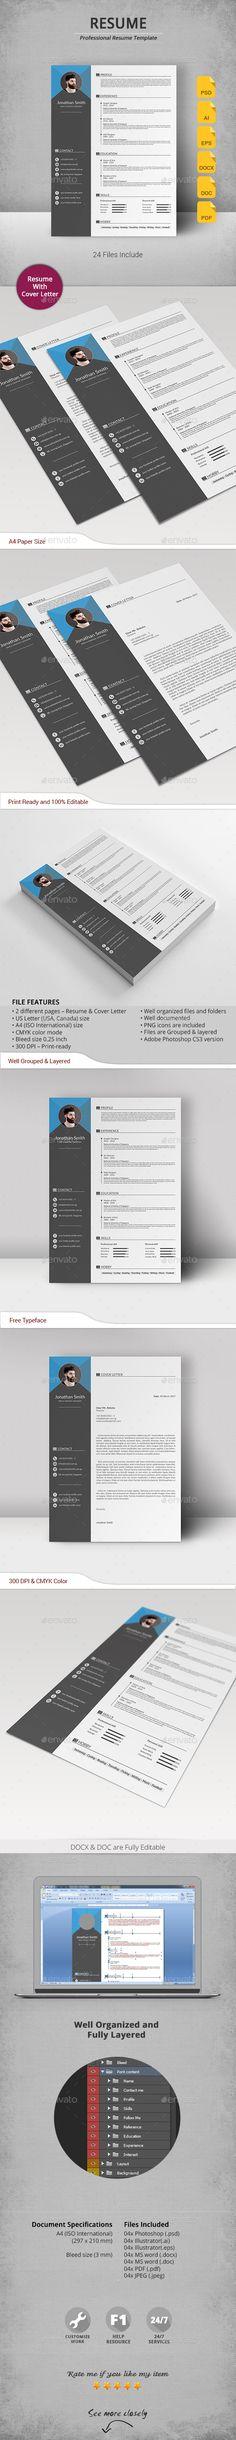 Resume Template PSD Vector EPS AI DOCX